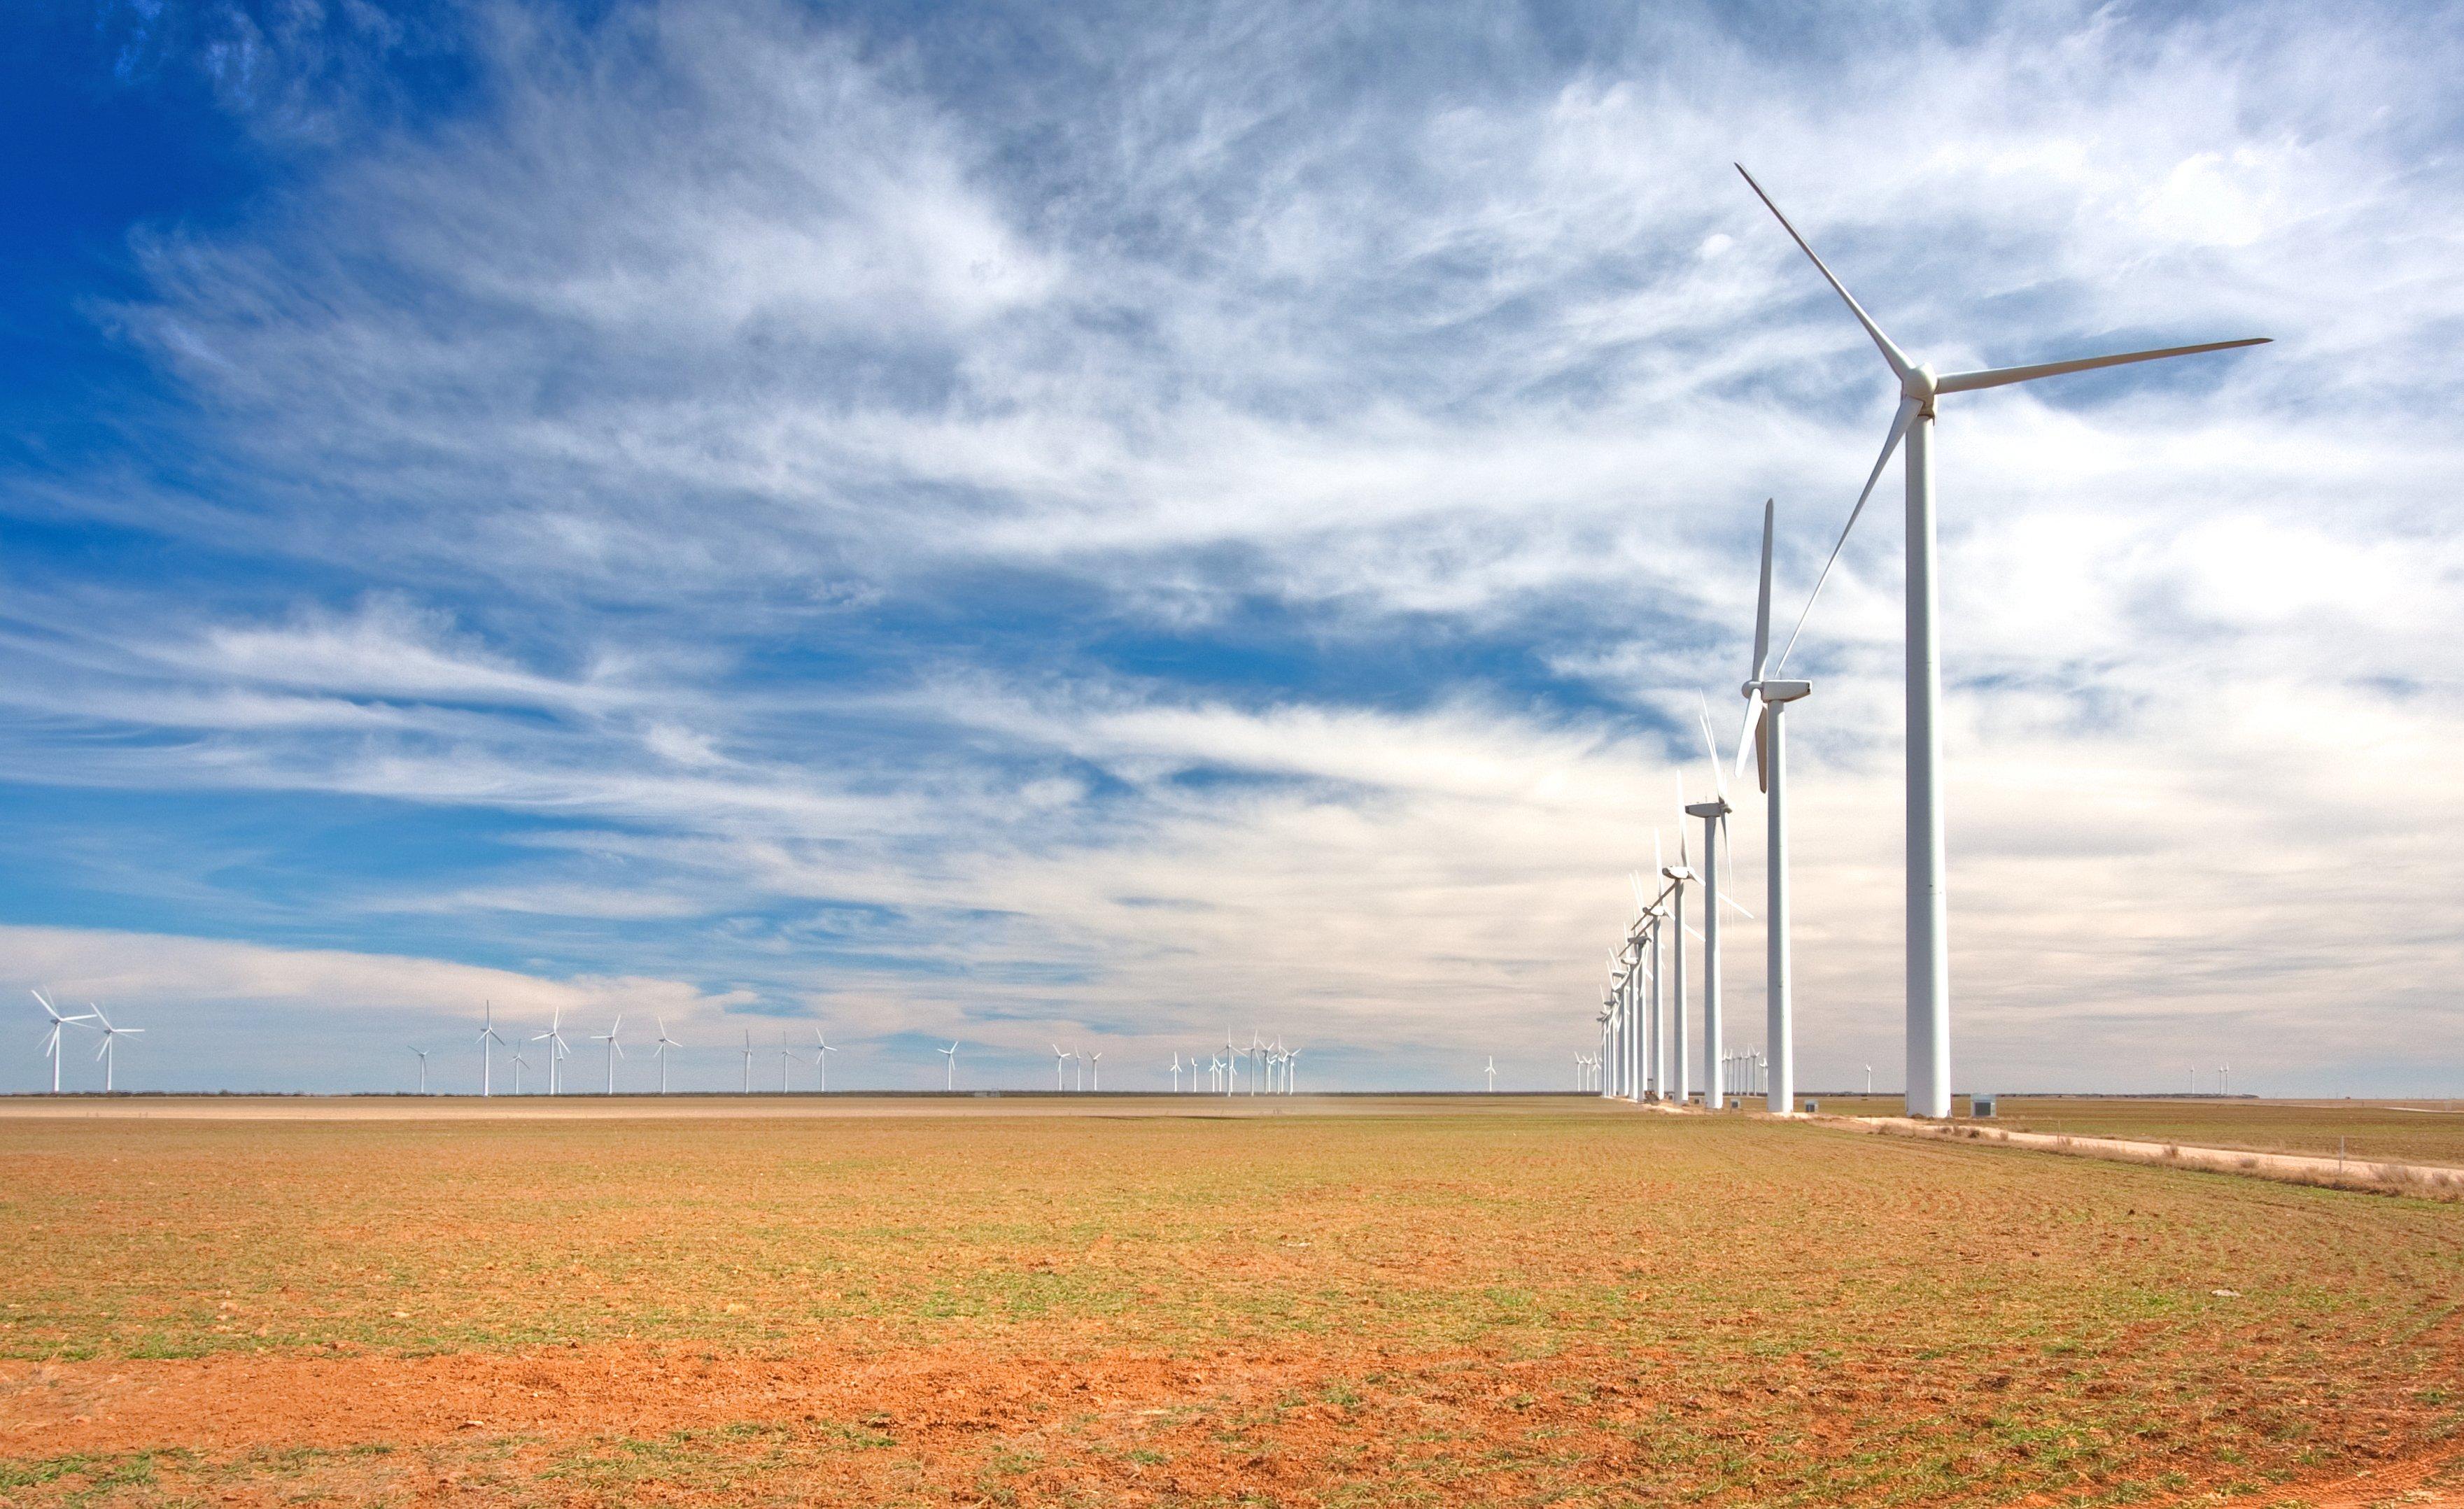 WindTurbine farm Texas-Shutterstock_93257440